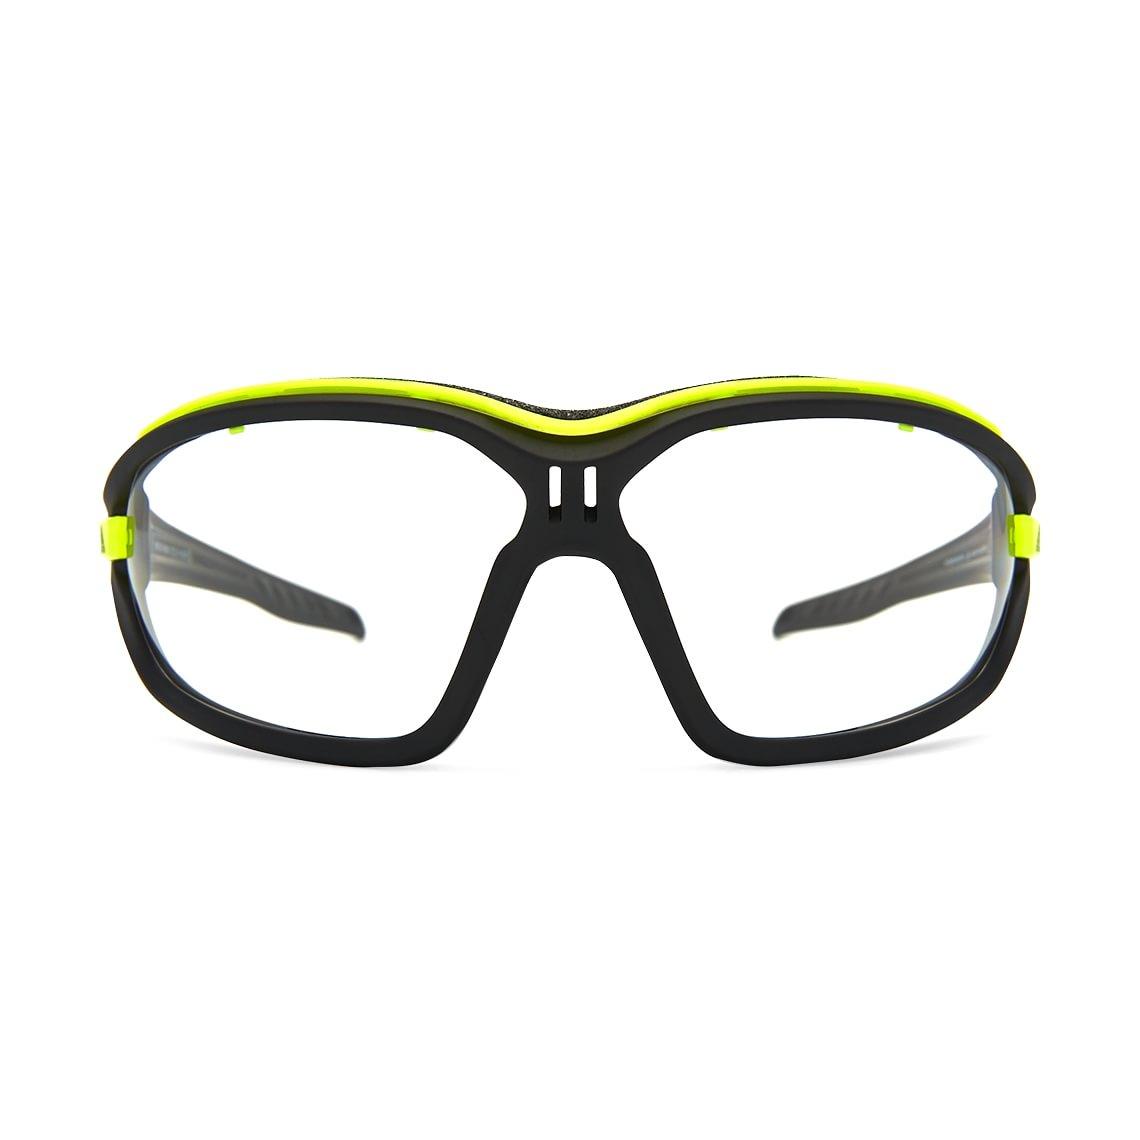 Adidas Evil Eye Evo Pro Large Vario A193 00 6058